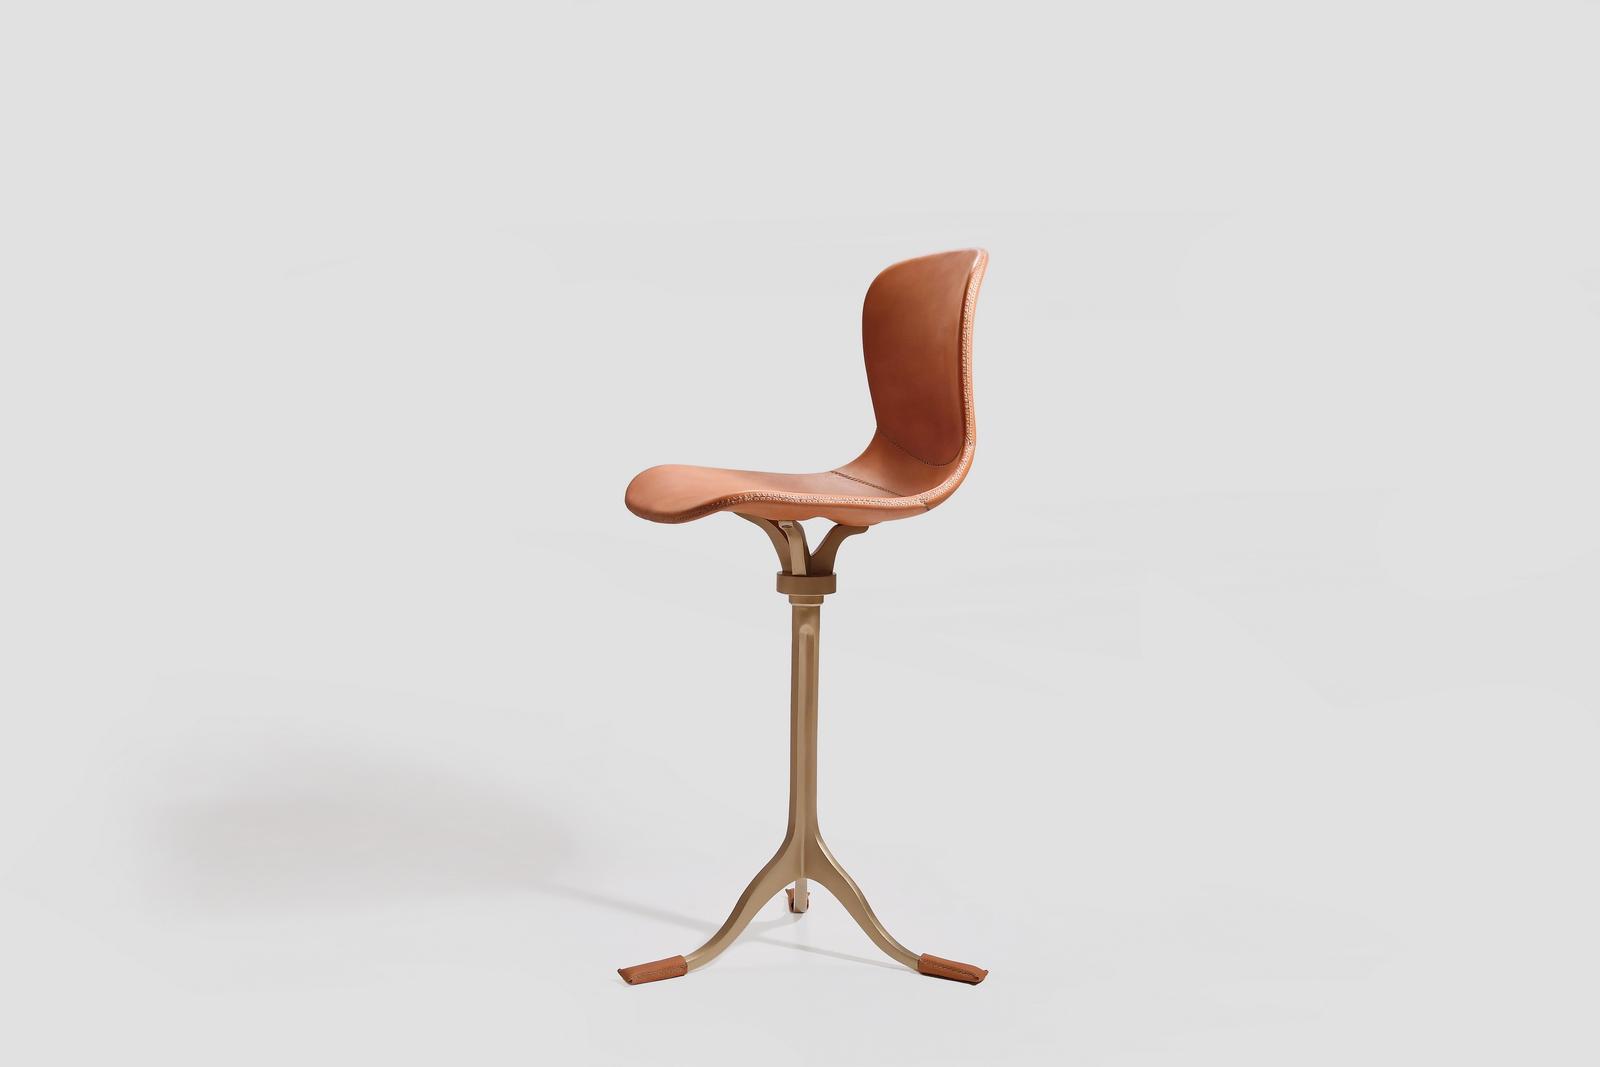 PTendercool-Chair-PT47-BS1-MB-200701-01